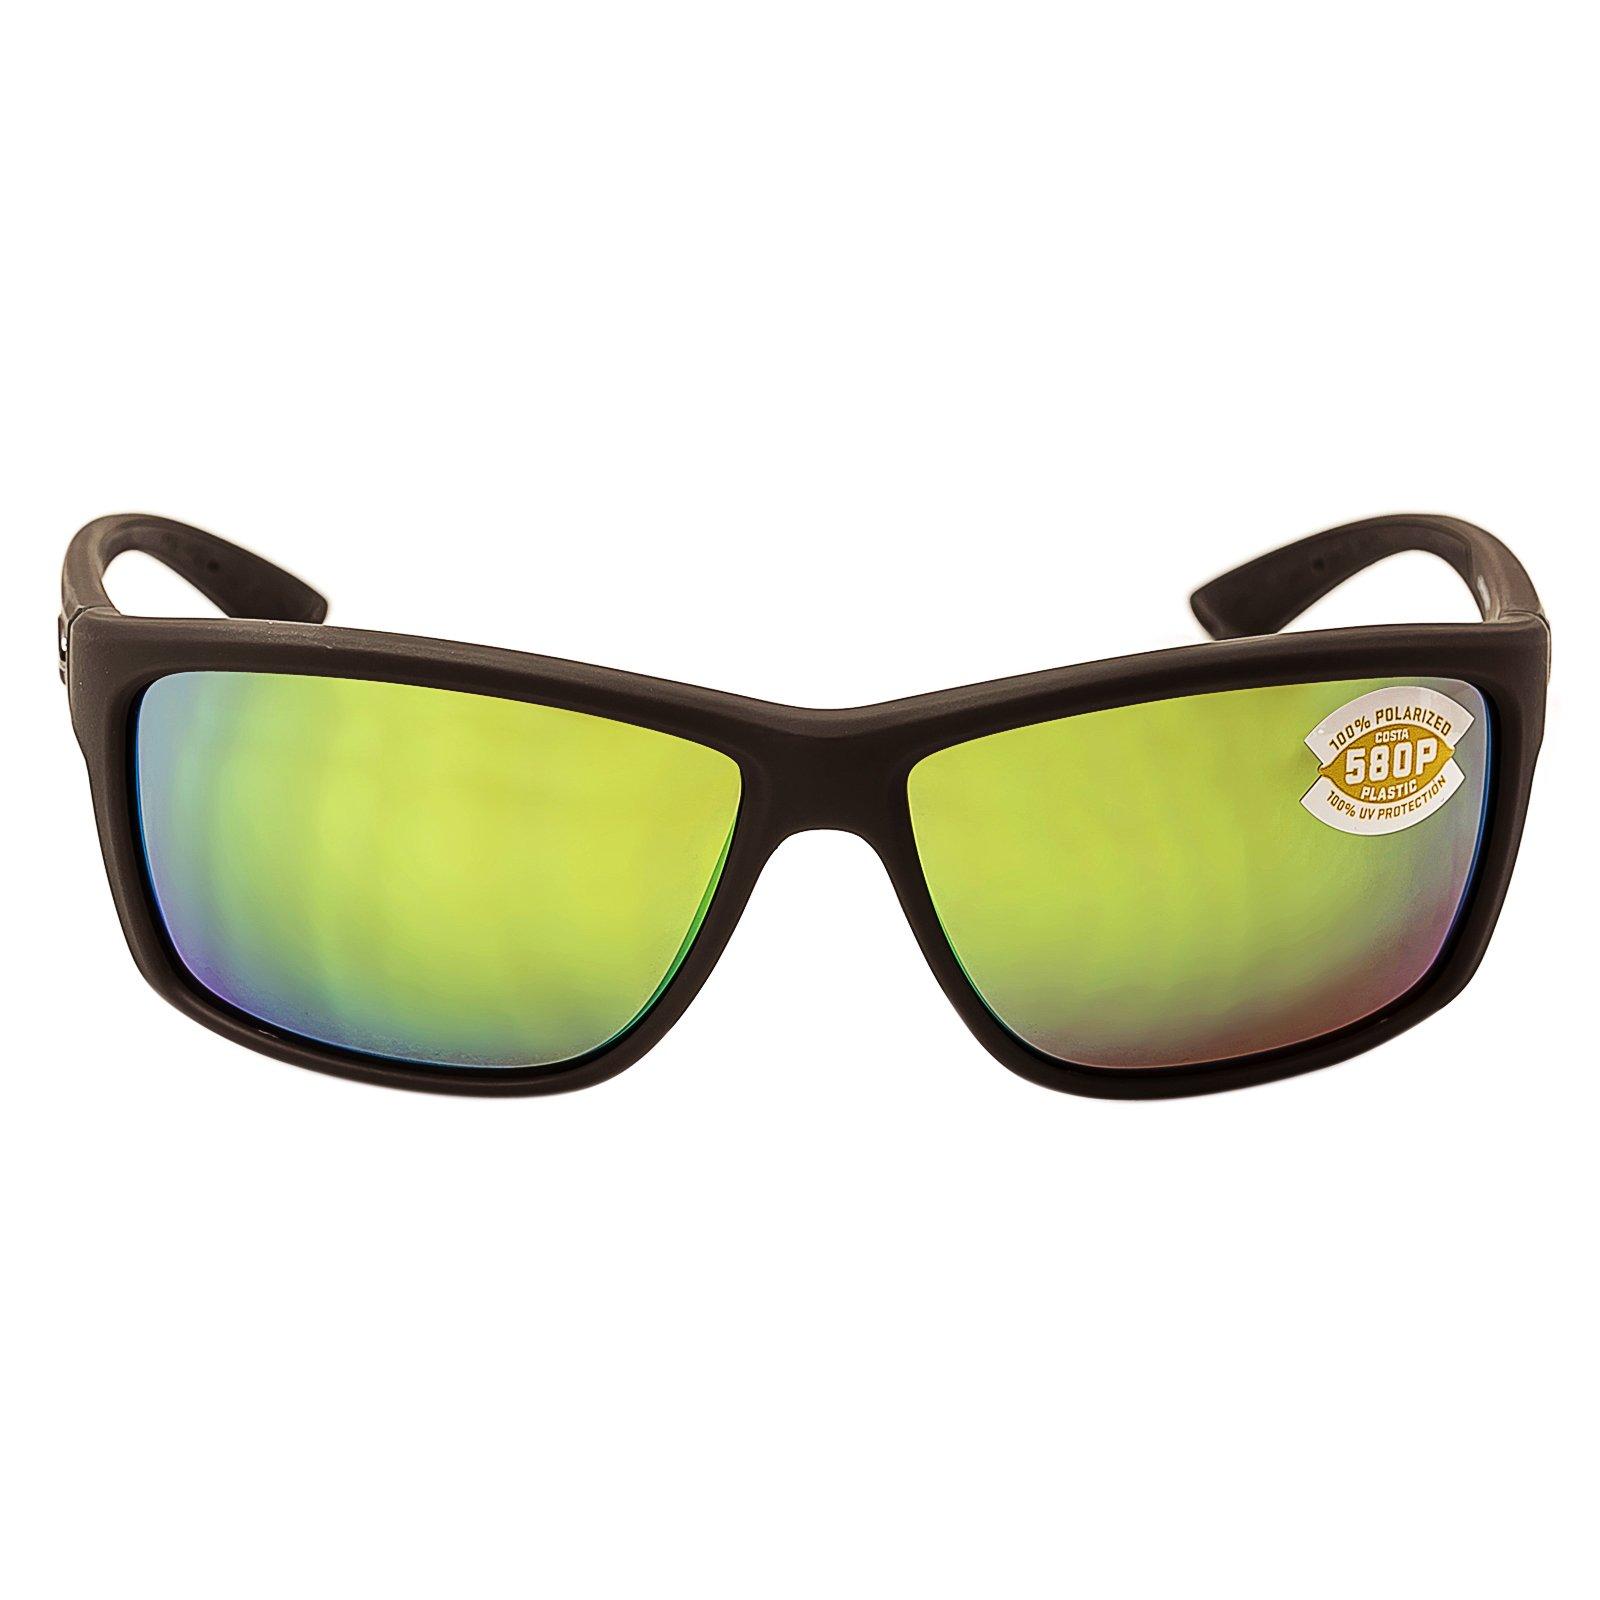 Costa Del Mar Mag Bay Sunglasses, Matte Gray, Green Mirror 580P Lens